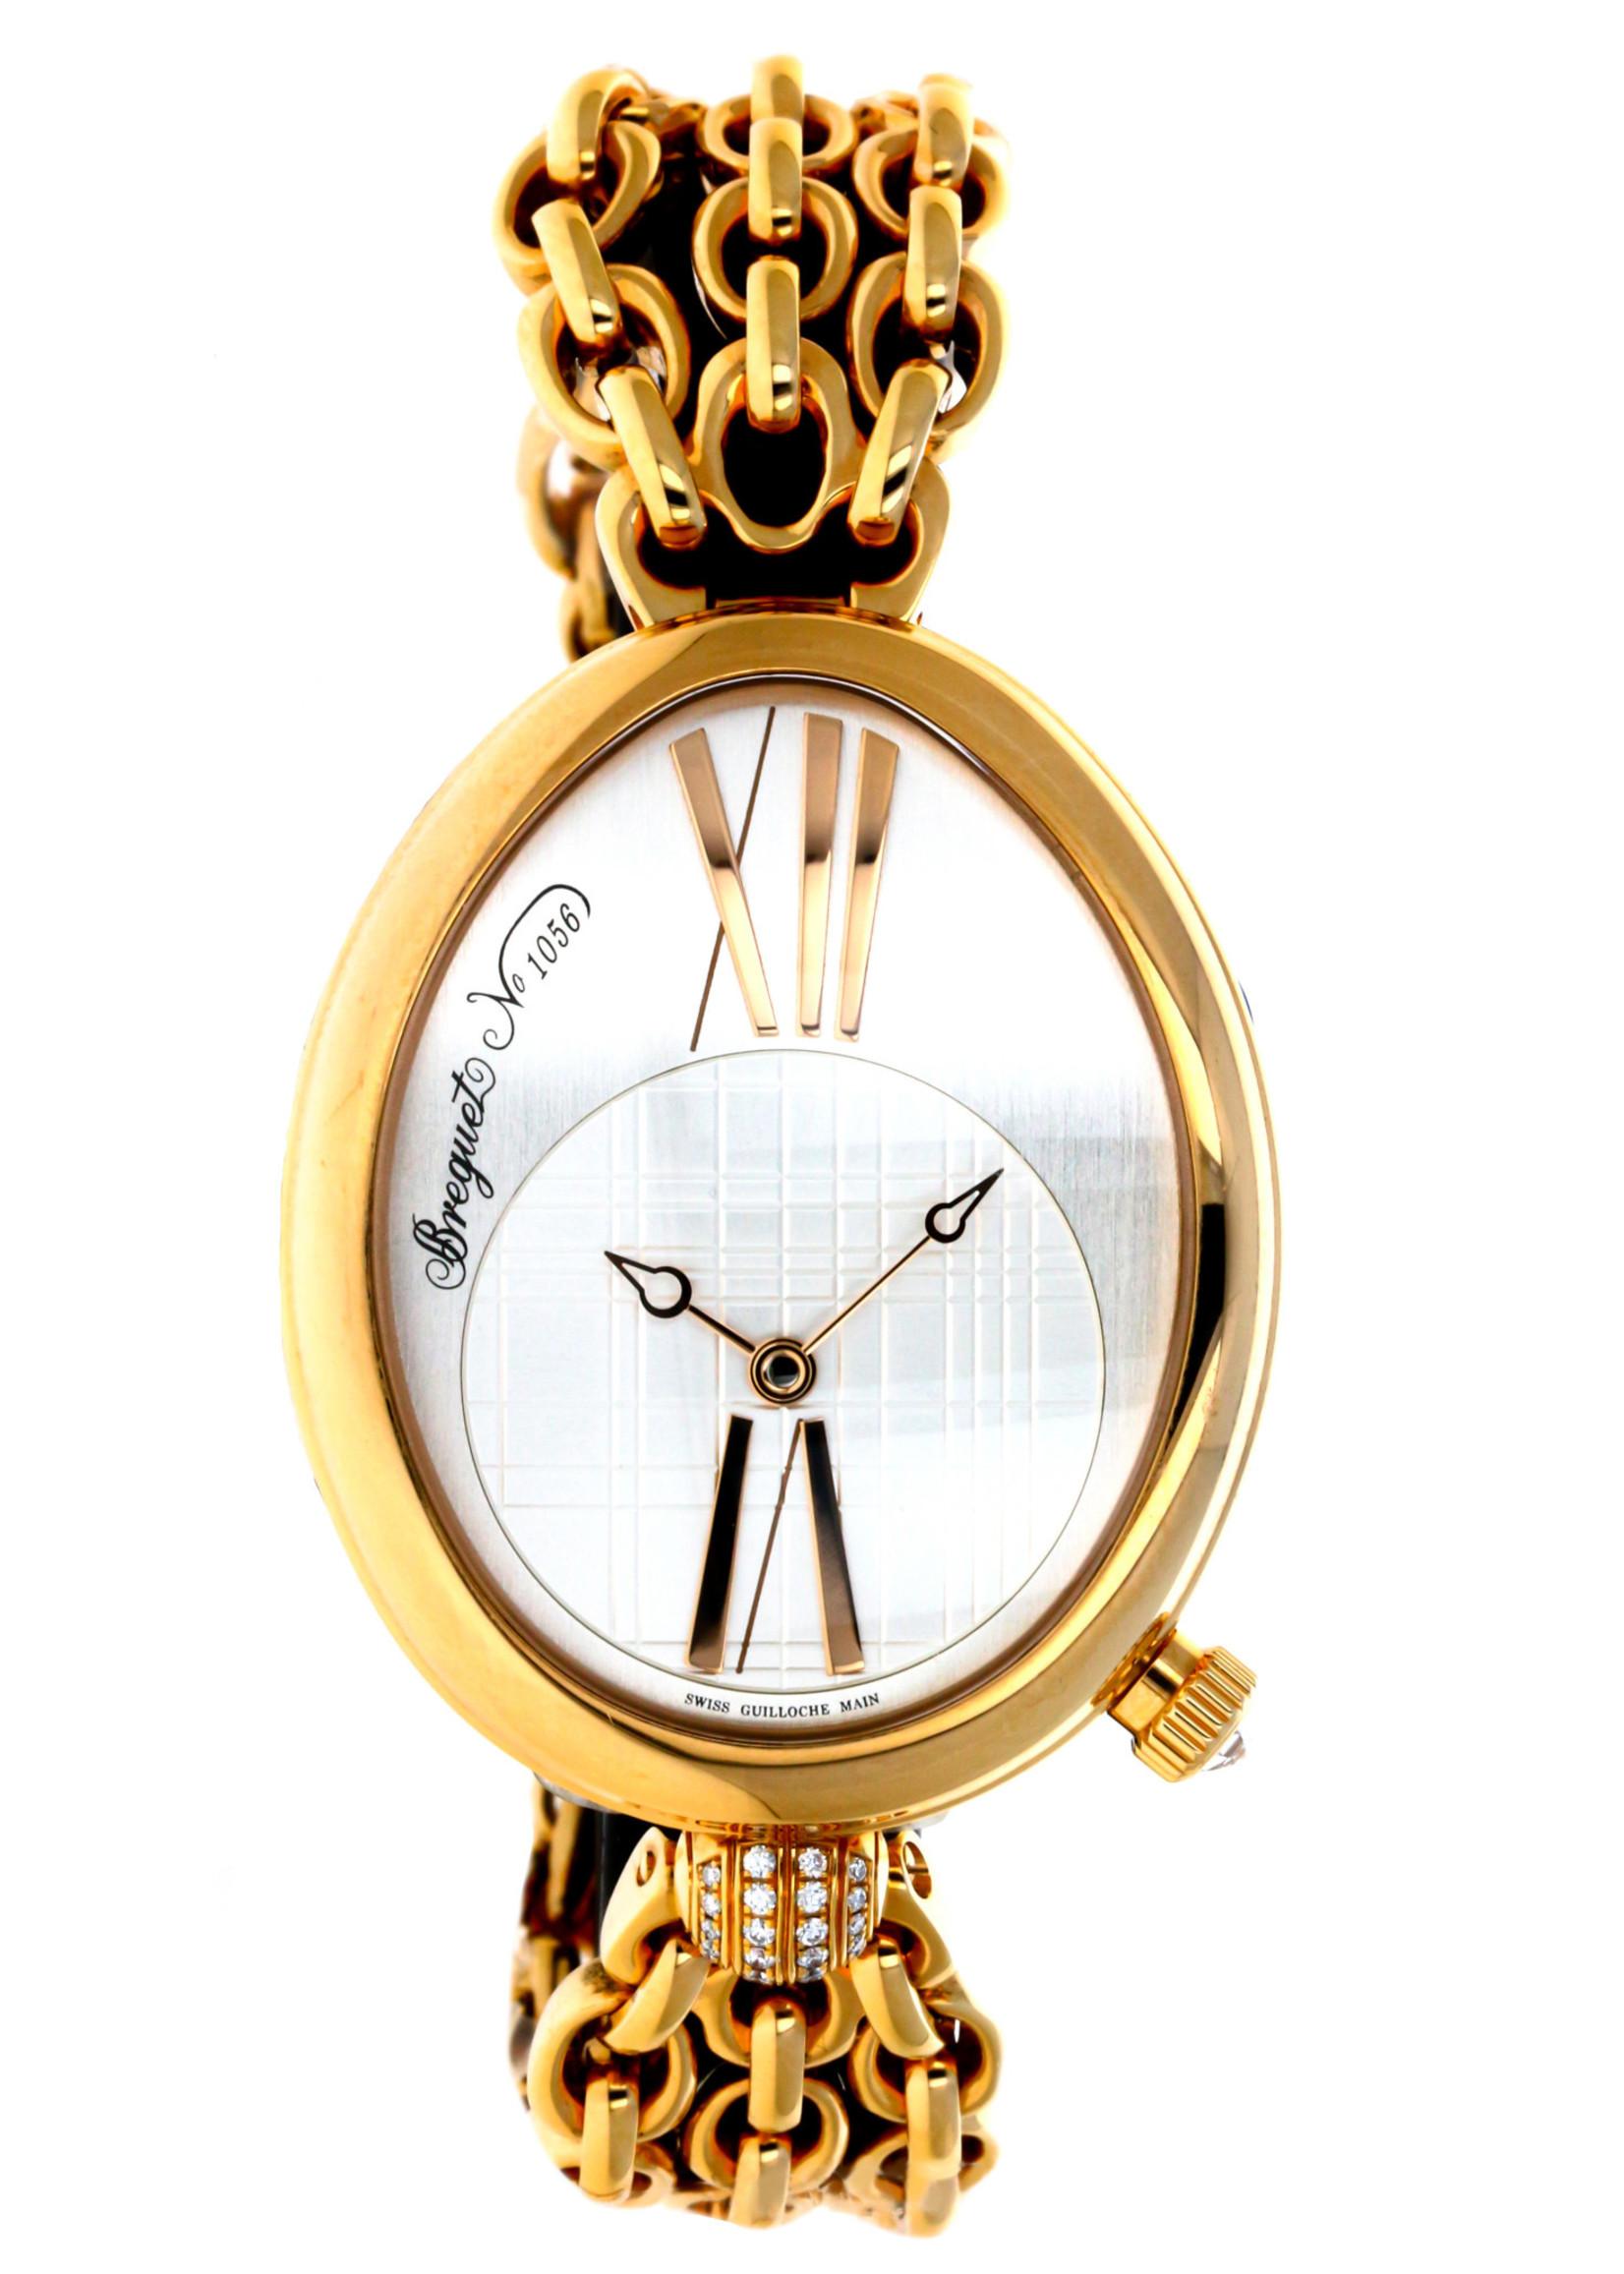 BREGUET Breguet Reine de Naples Automatic 35mm Ladies Watch (B+P) #8968